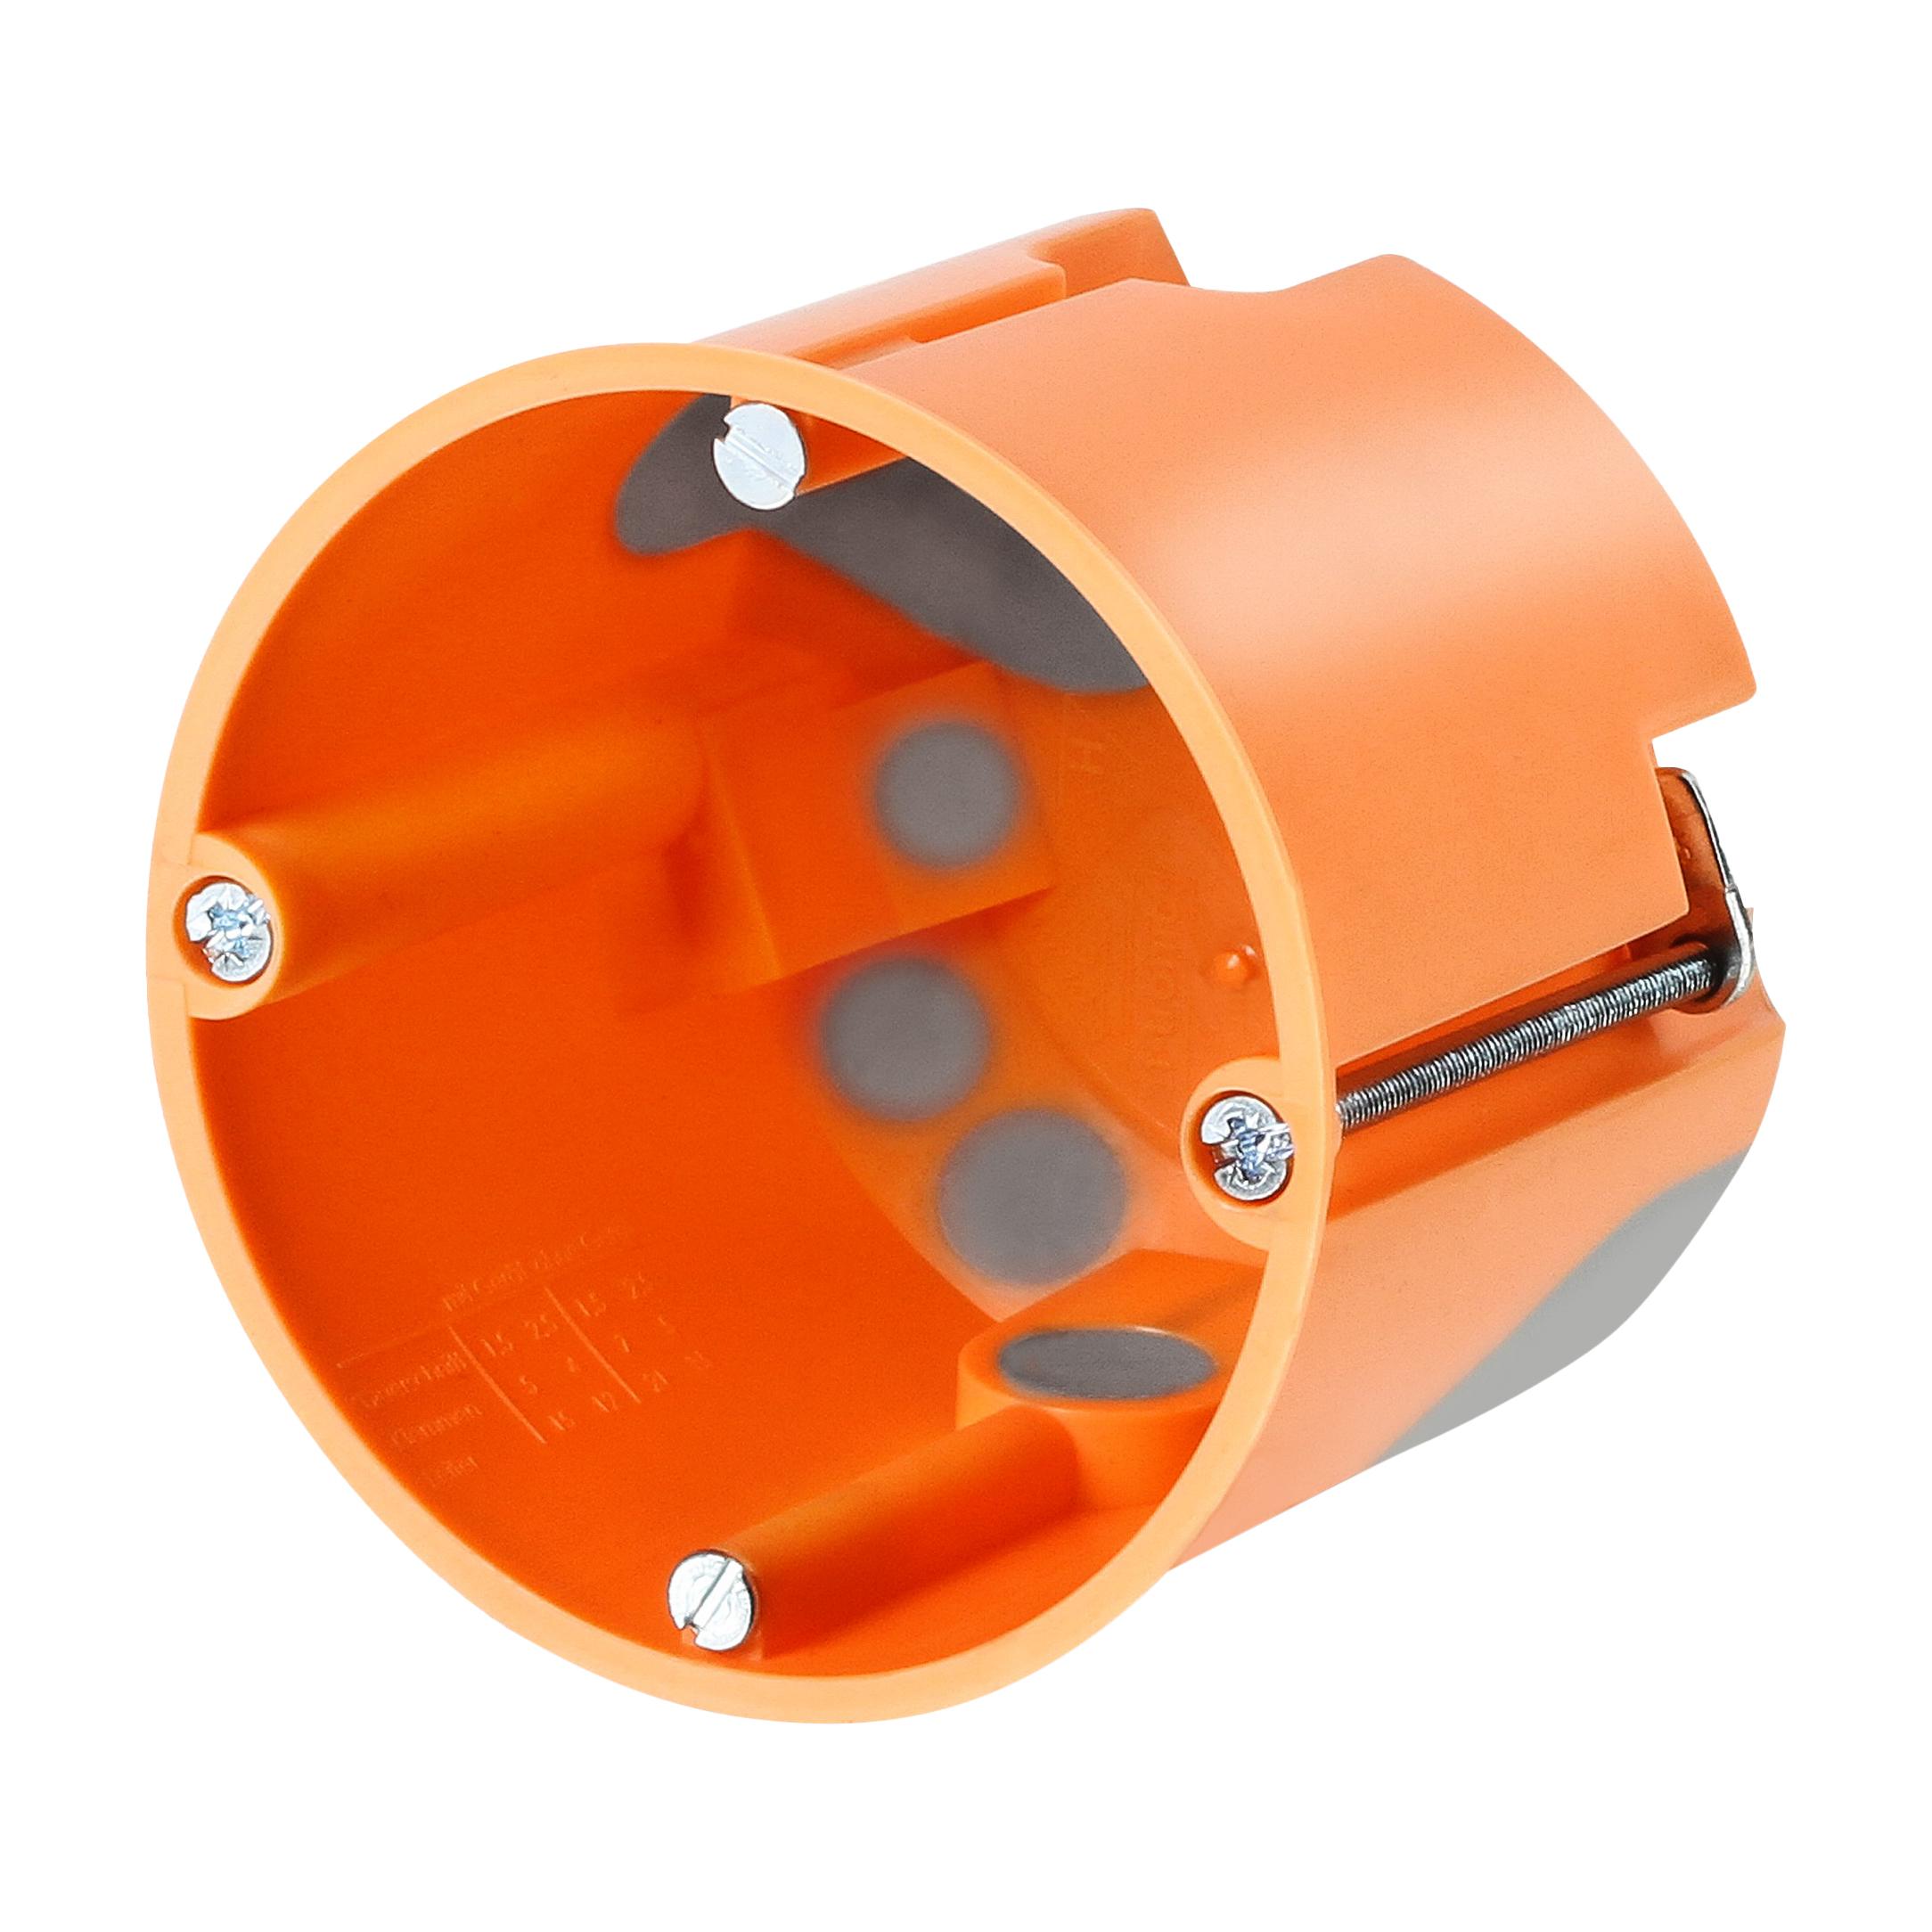 100 Stk Hohlwandabzweigdose winddicht d68/t61mm, orange, M25 ,PP GTDW3500--